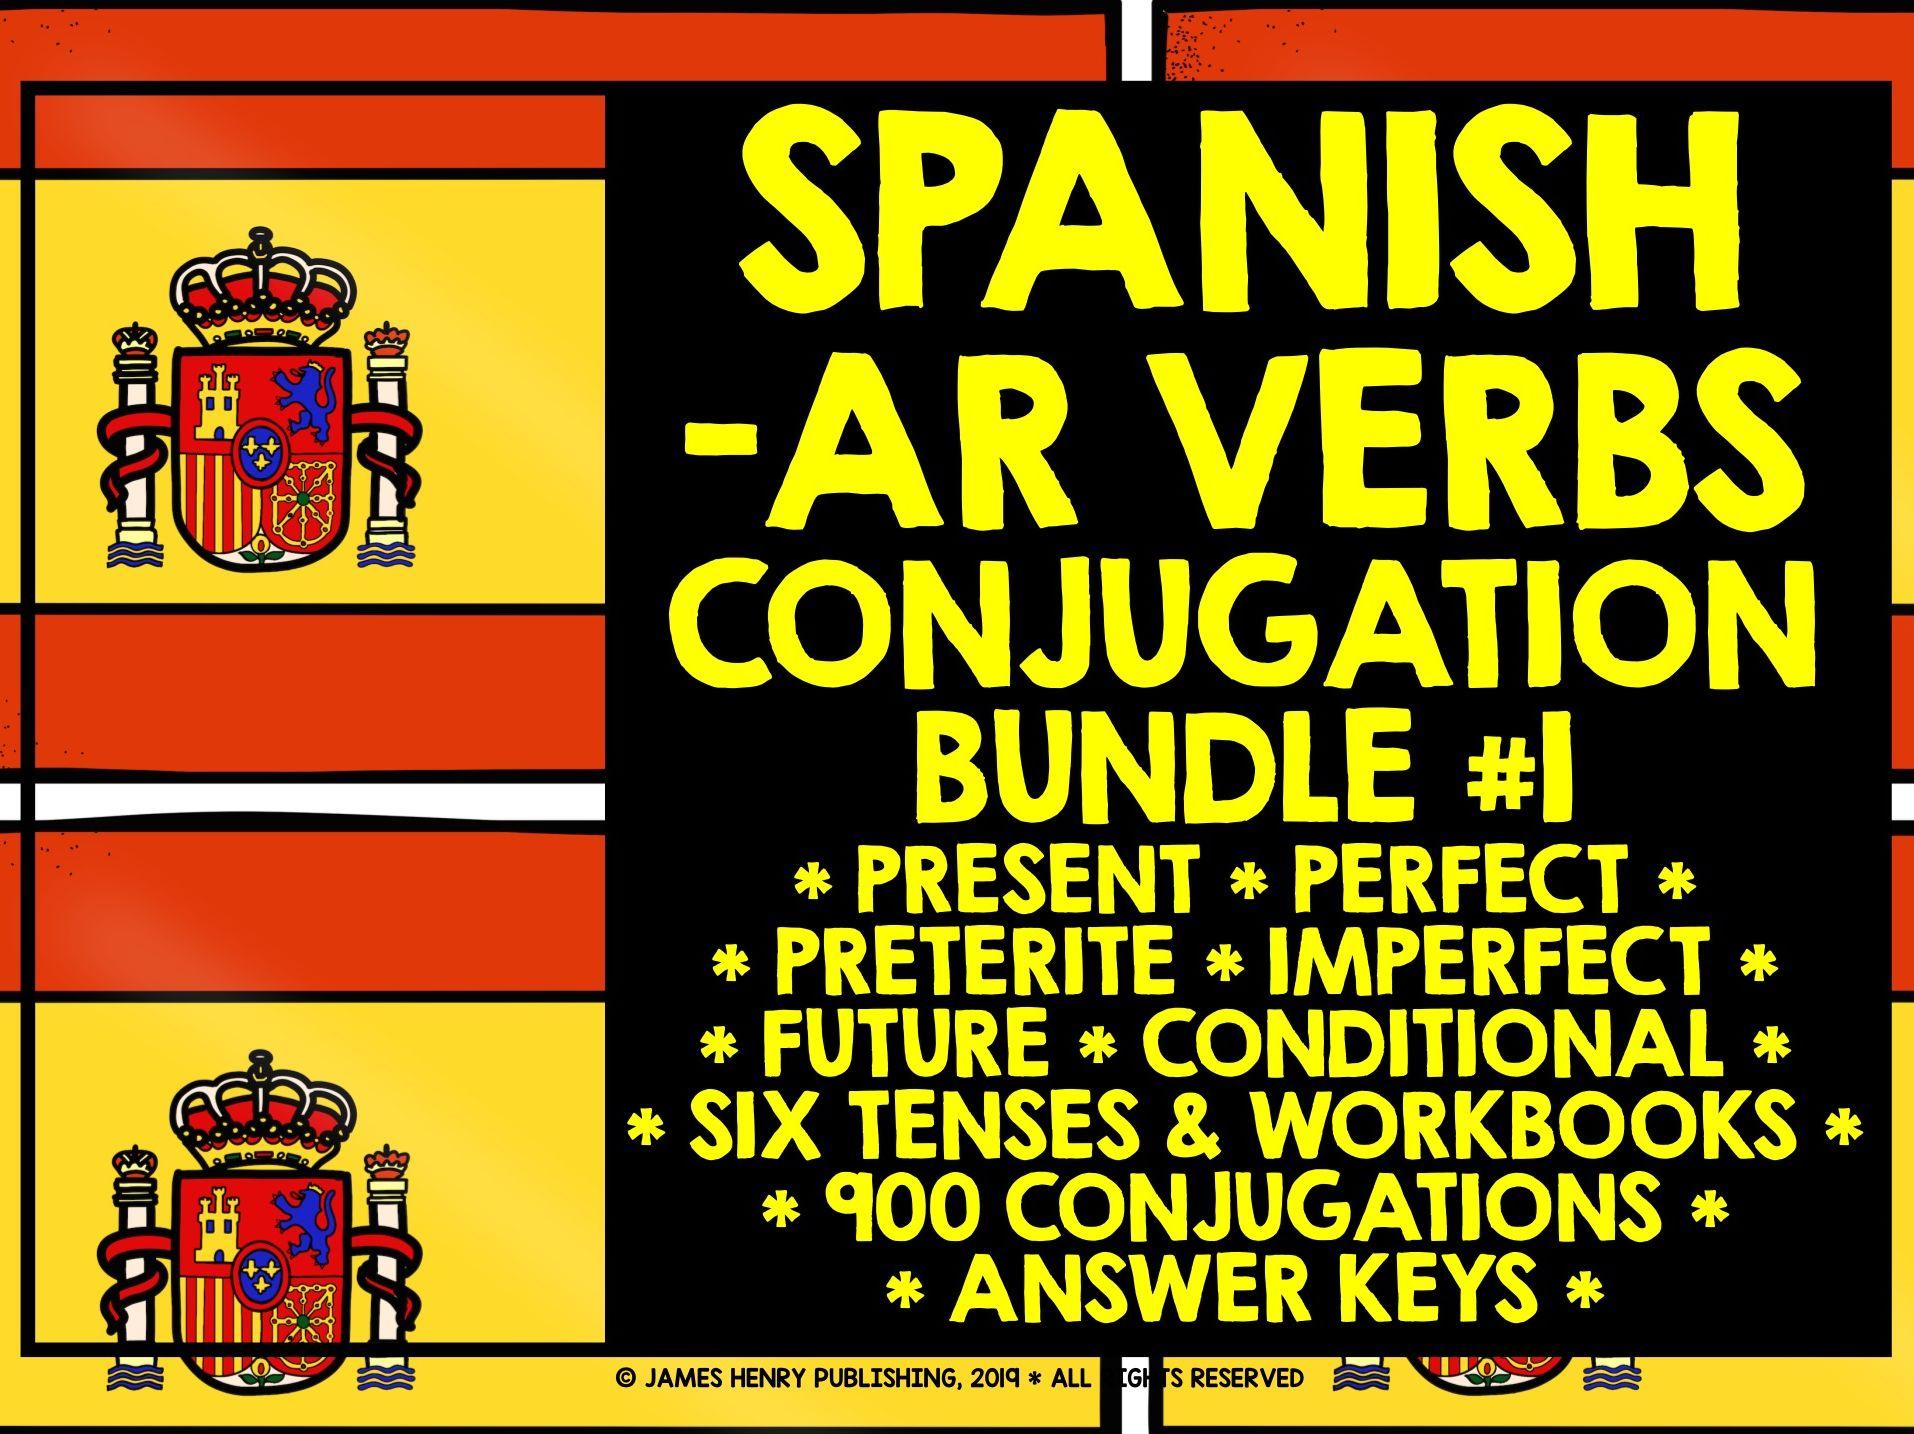 SPANISH AR VERBS GCSE CONJUGATION PRACTICE BUNDLE #1